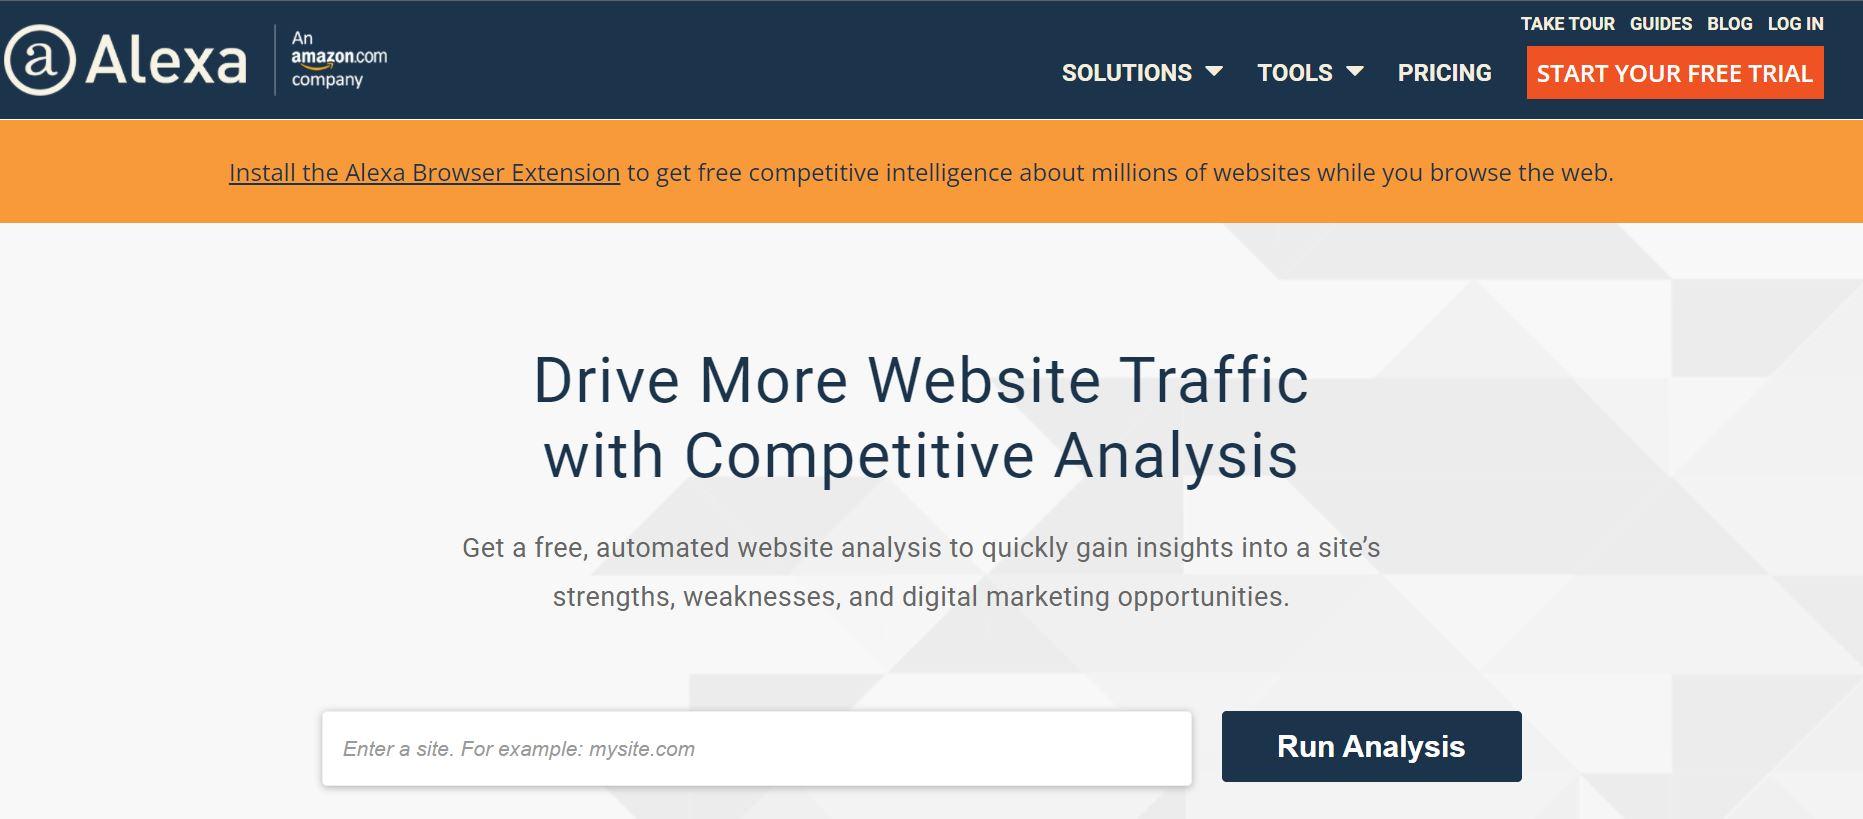 alexa- amazon website traffic